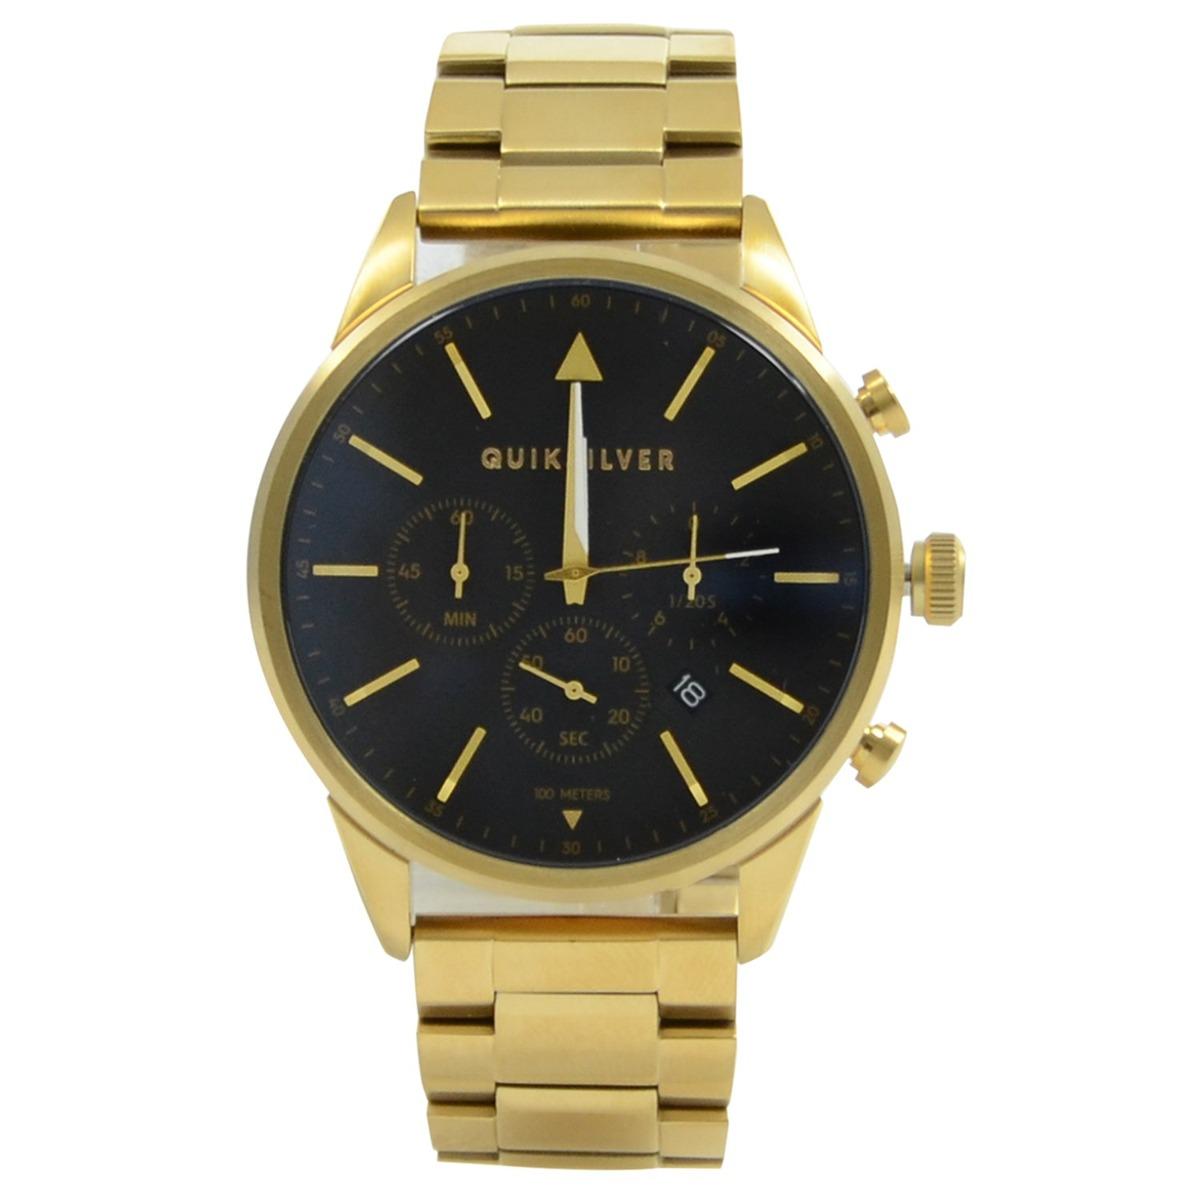 6fd99f2a9fd8a relógio quiksilver the time box chrono metal dourado. Carregando zoom.